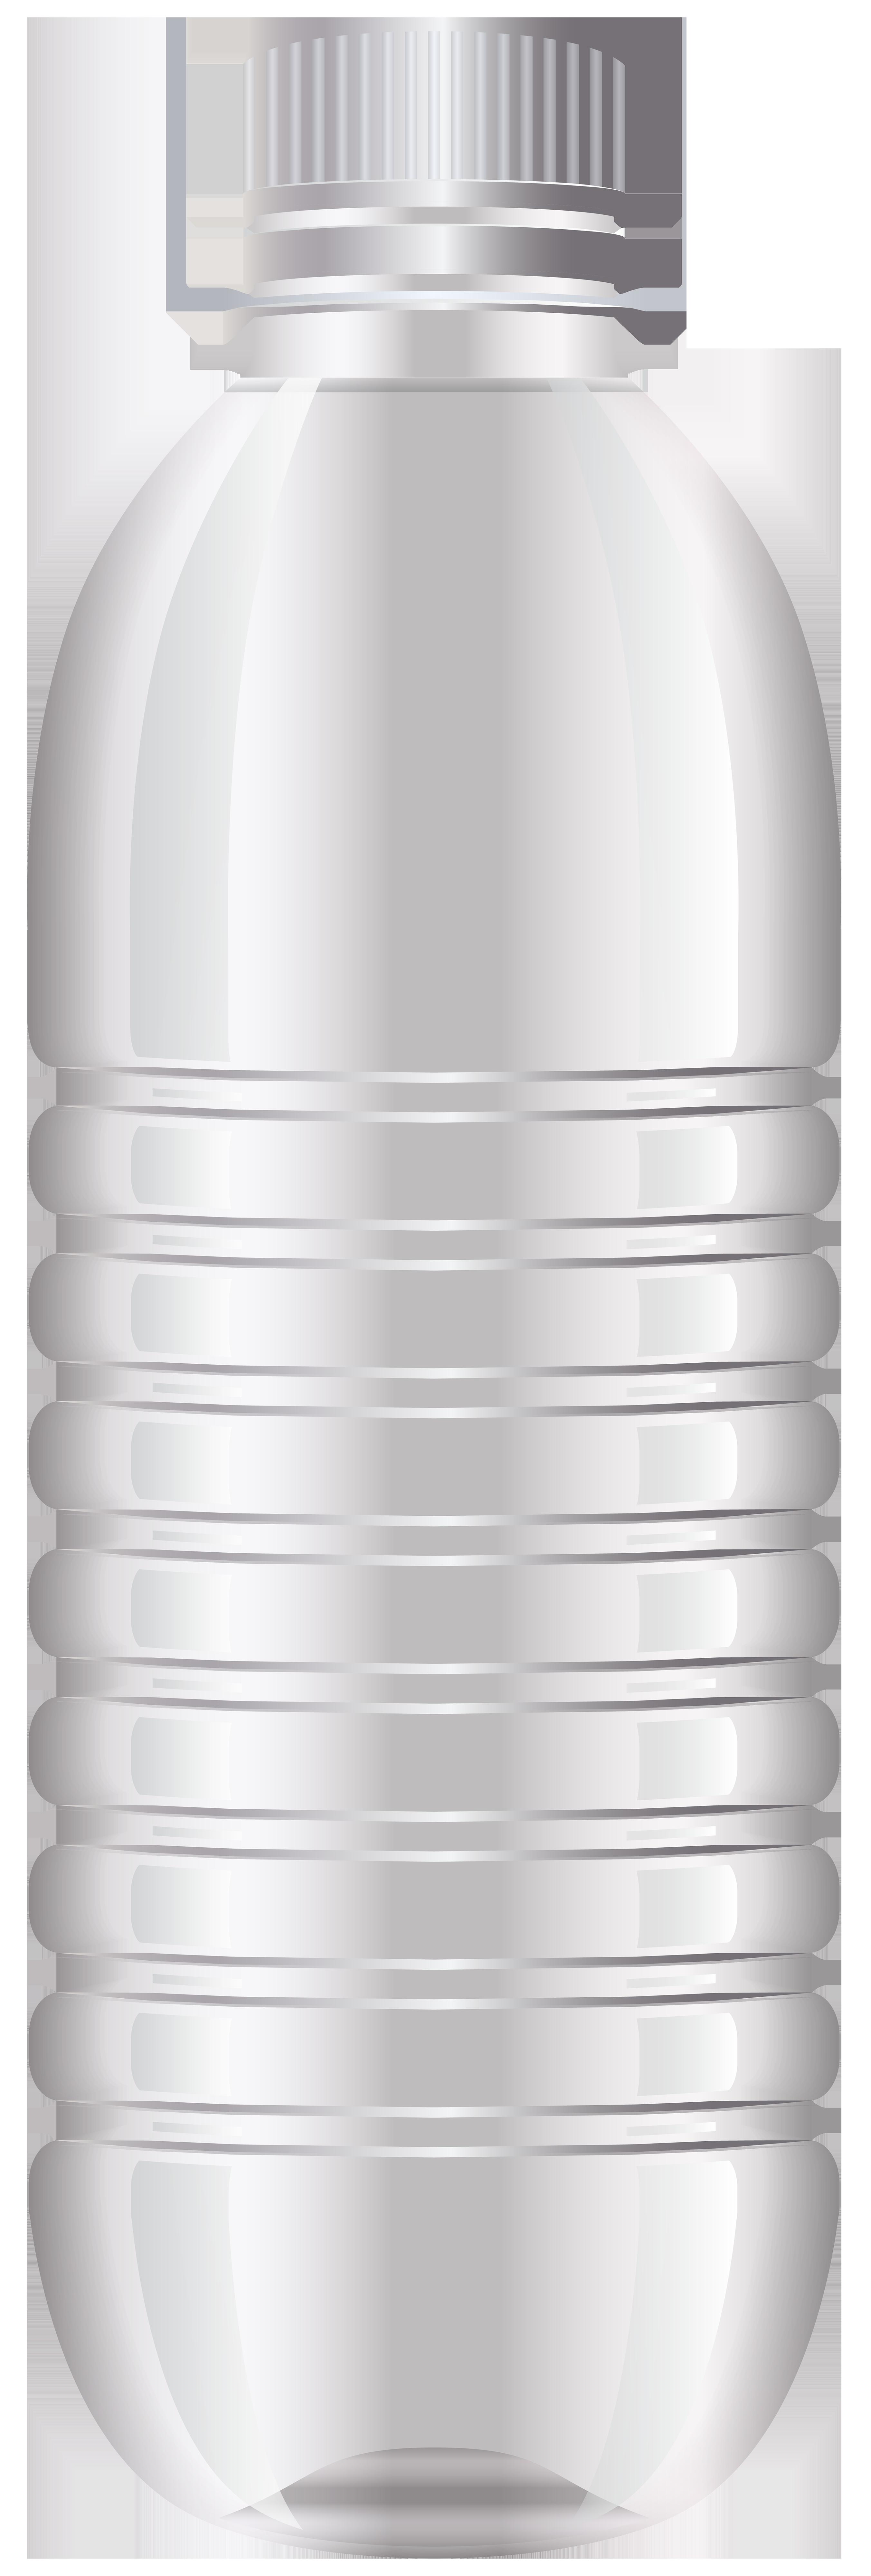 Clipart backpack water bottle. Jokingart com